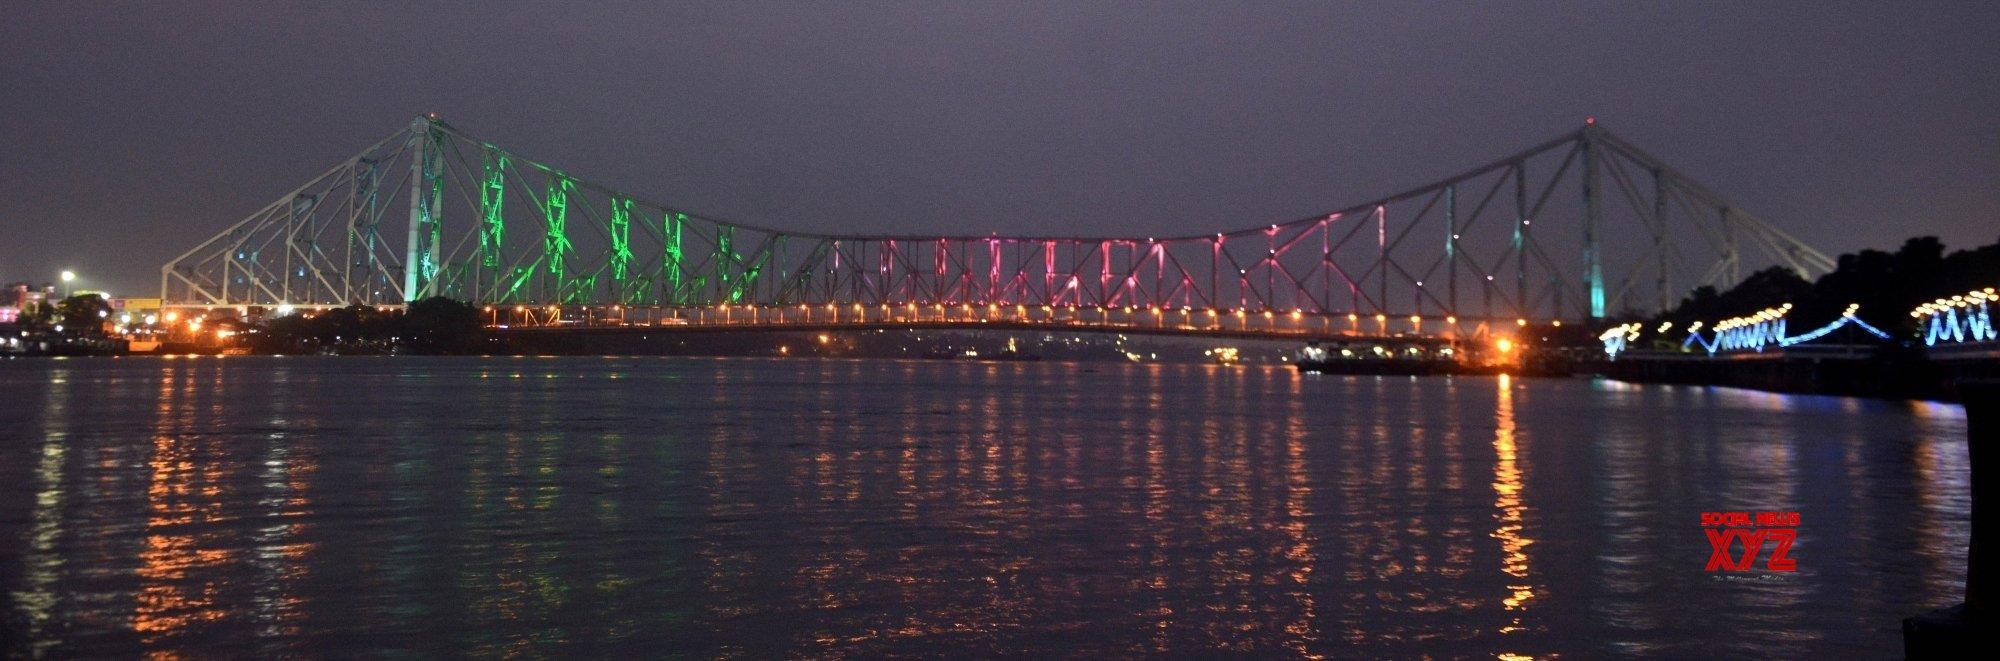 Kolkata: Illuminated Howrah Bridge for Mohun Bagan, I - League champion #Gallery